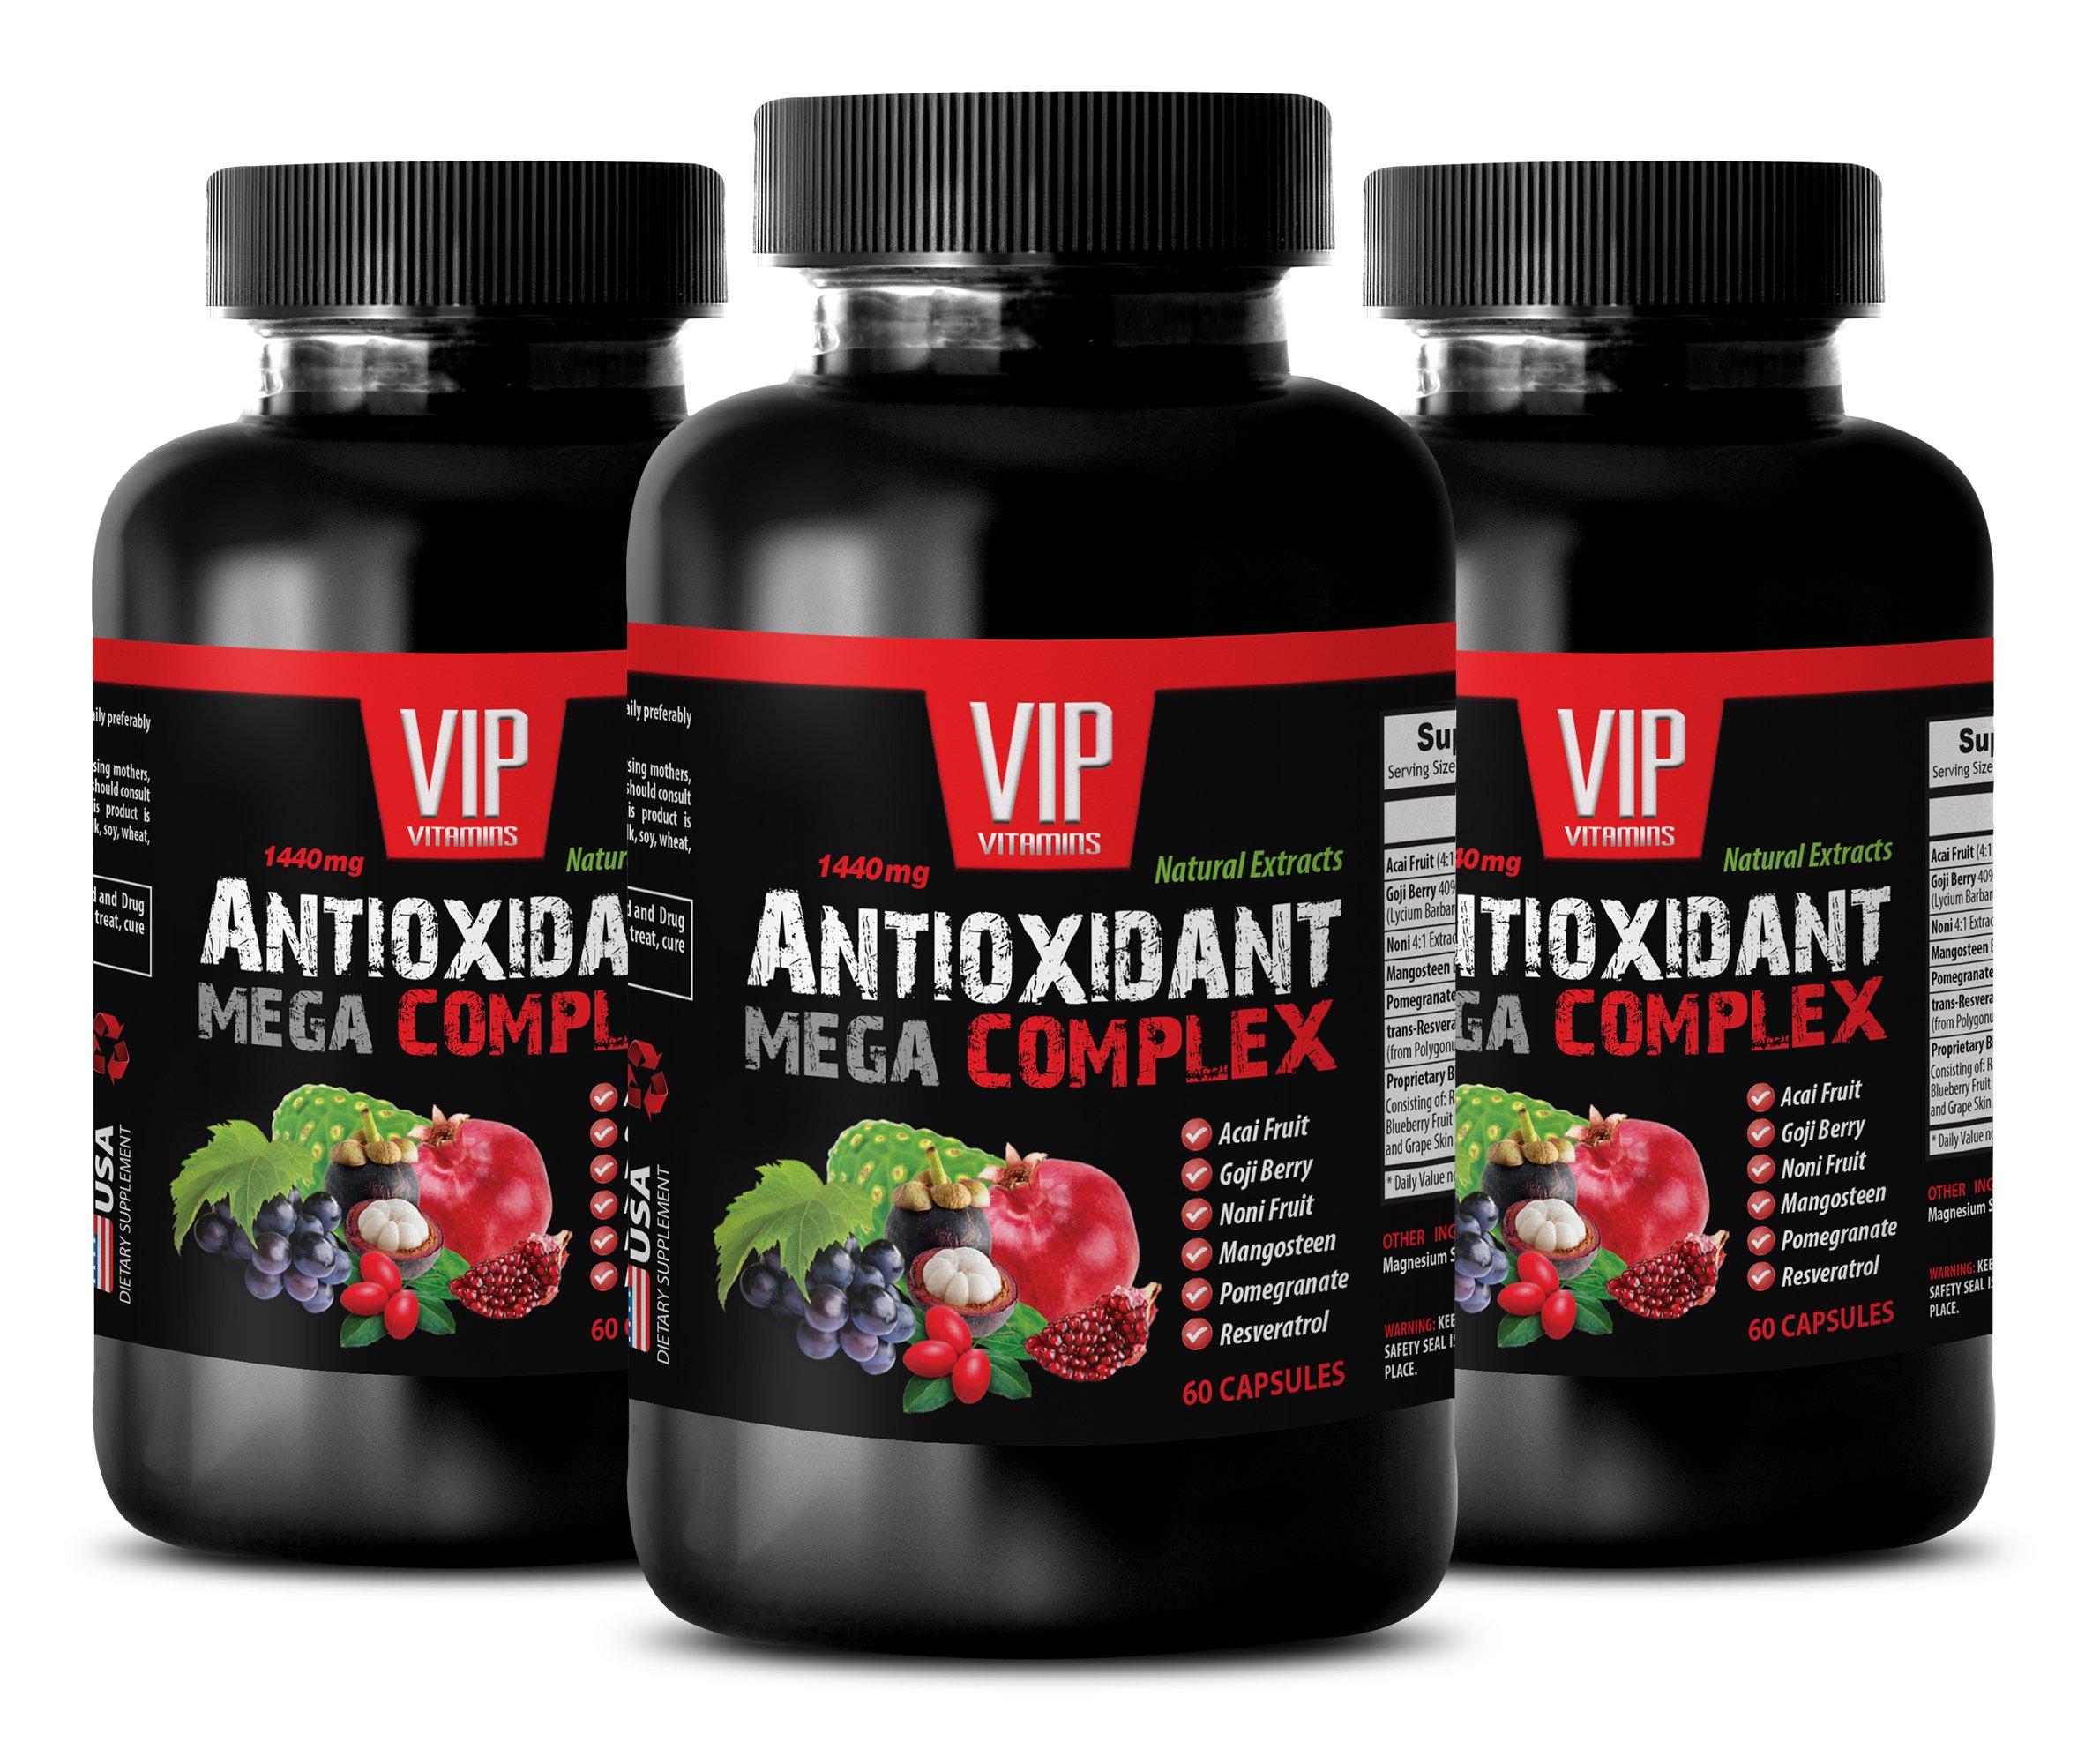 Antioxidant nutritional supplements - ANTIOXIDANT MEGA COMPLEX - Pomegranate supplement - 3 Bottles 180 Capsules